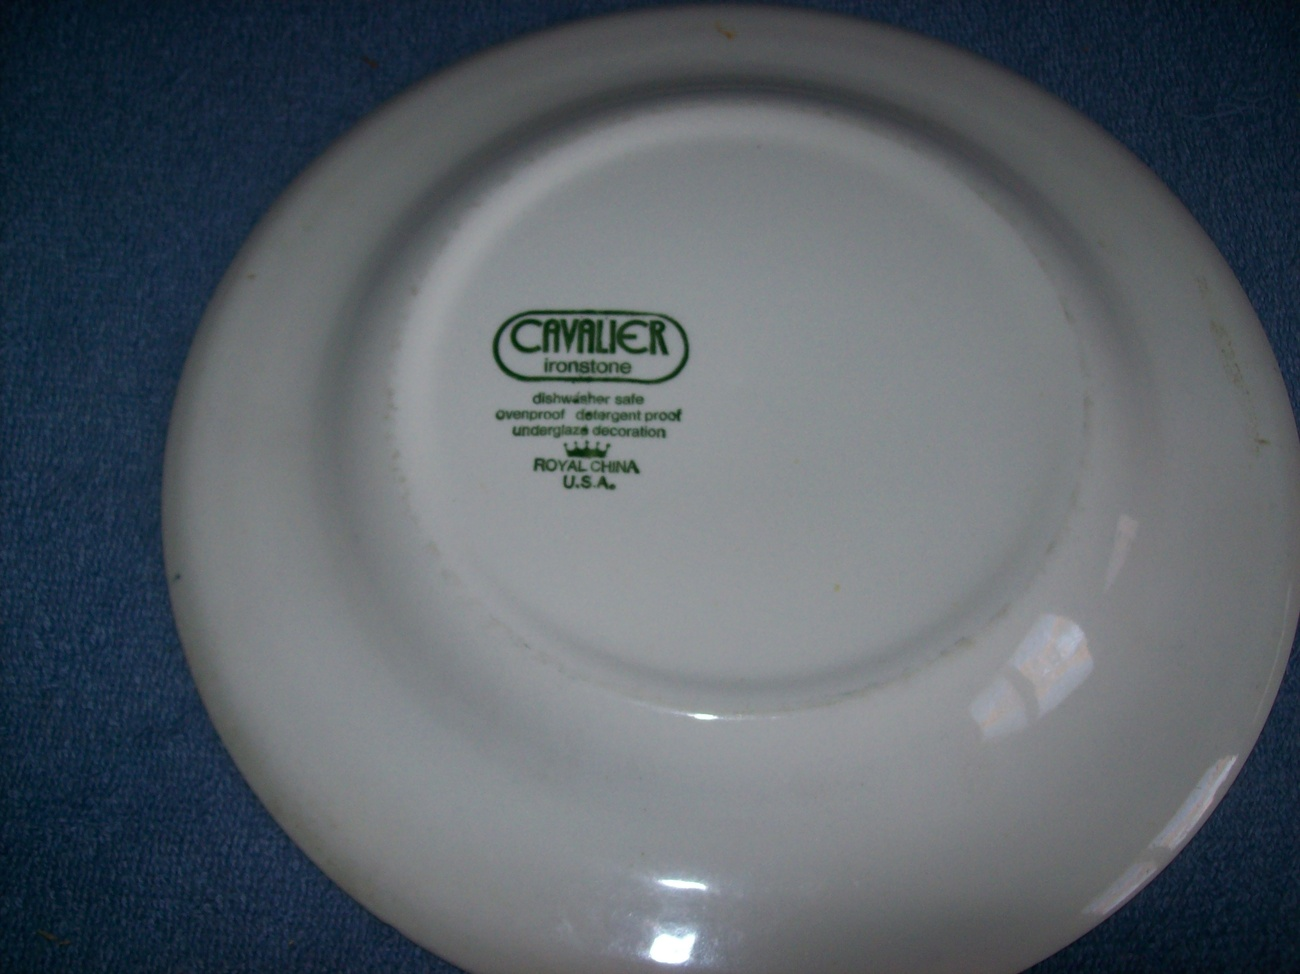 Cavalier Ironstone Royal China Blue White Dinner Plate